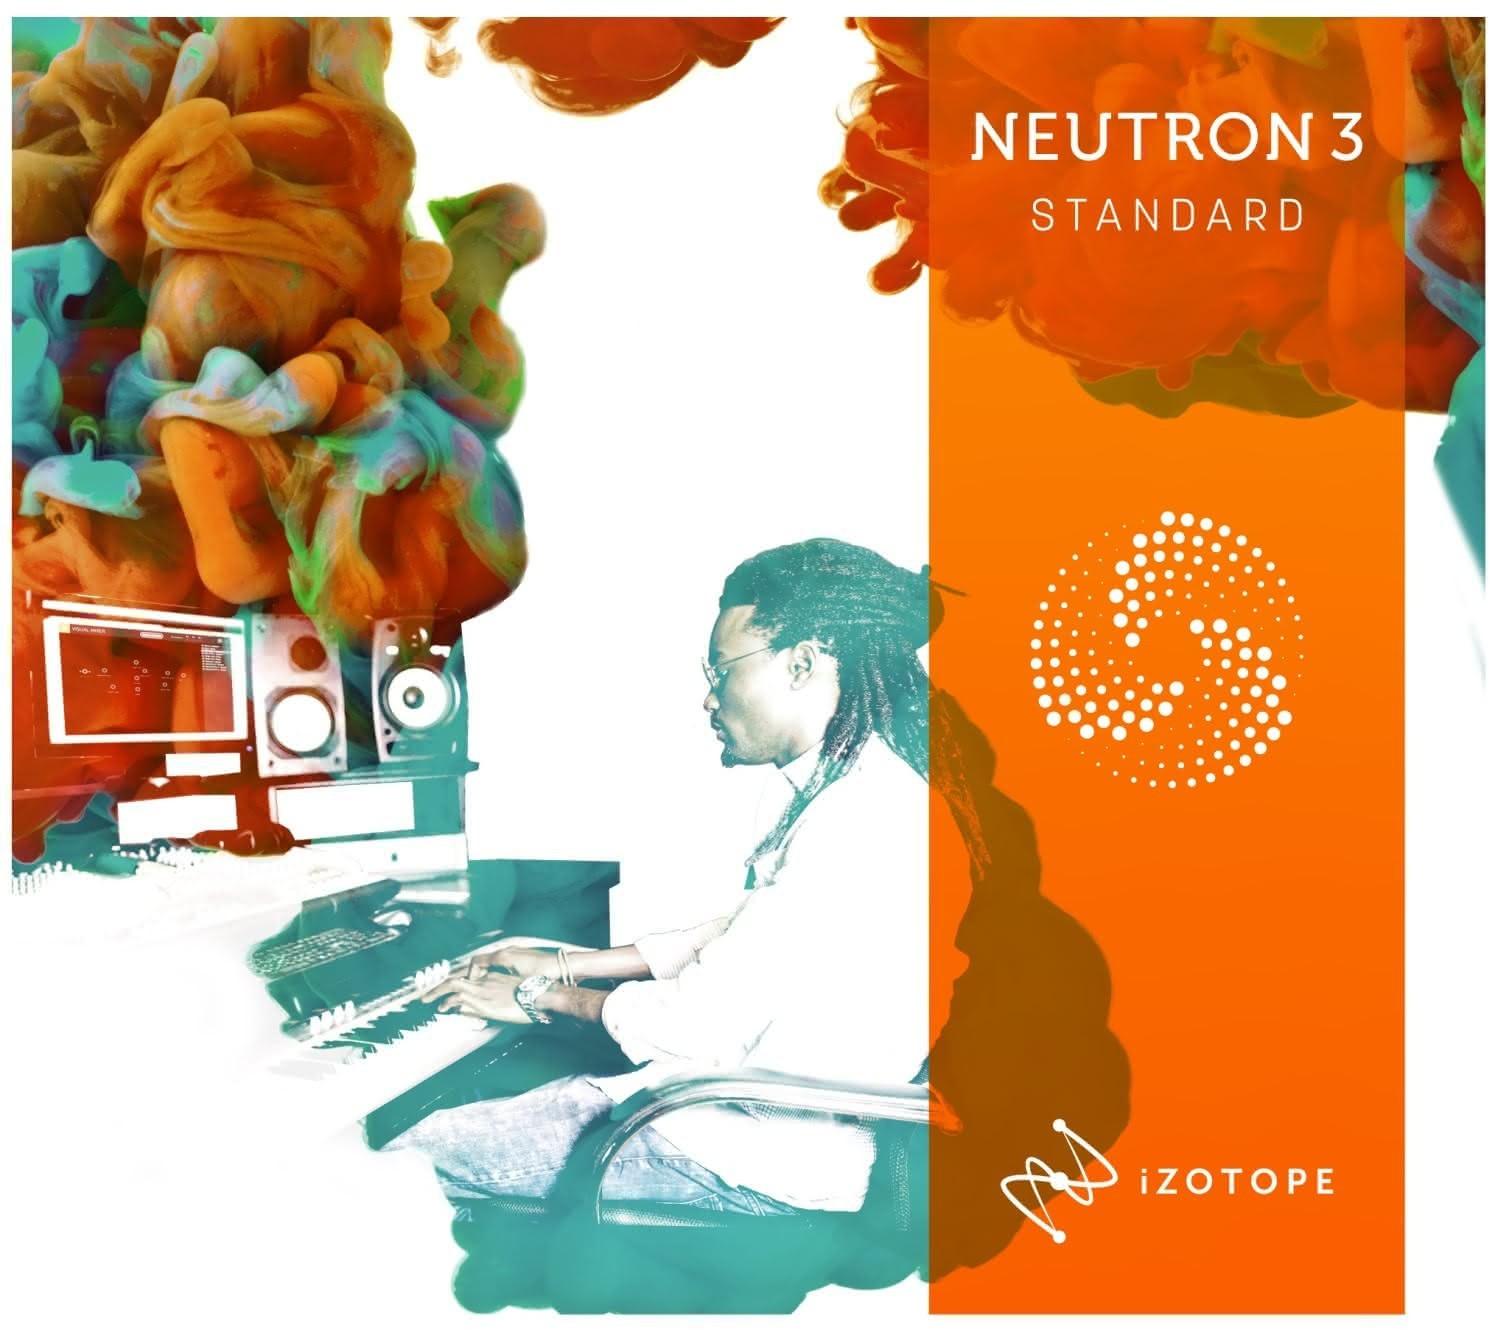 Image of Izotope Neutron 3